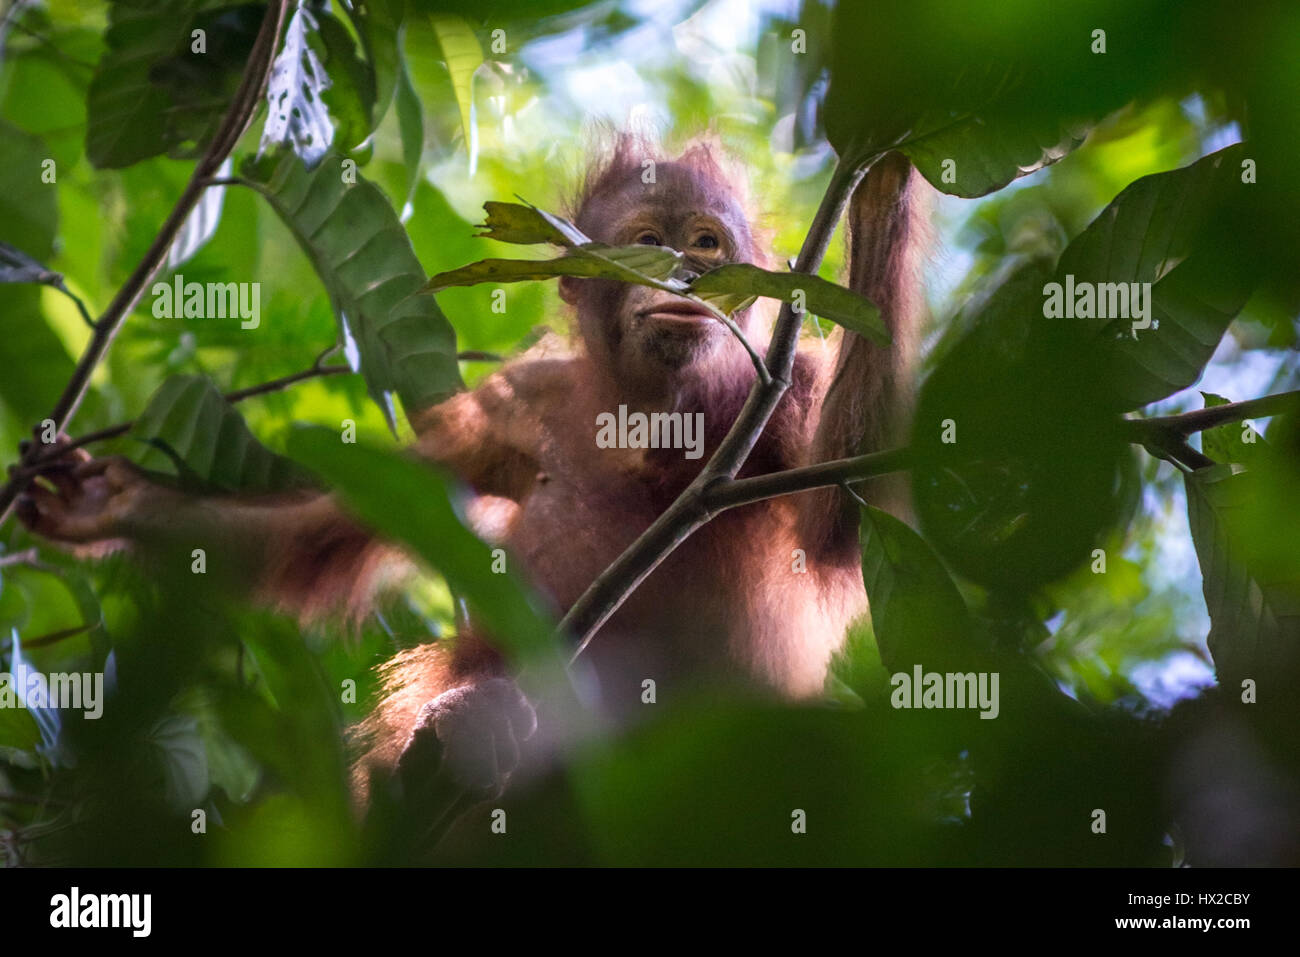 Baby Bornean orangutan ricerca per alimenti. Immagini Stock